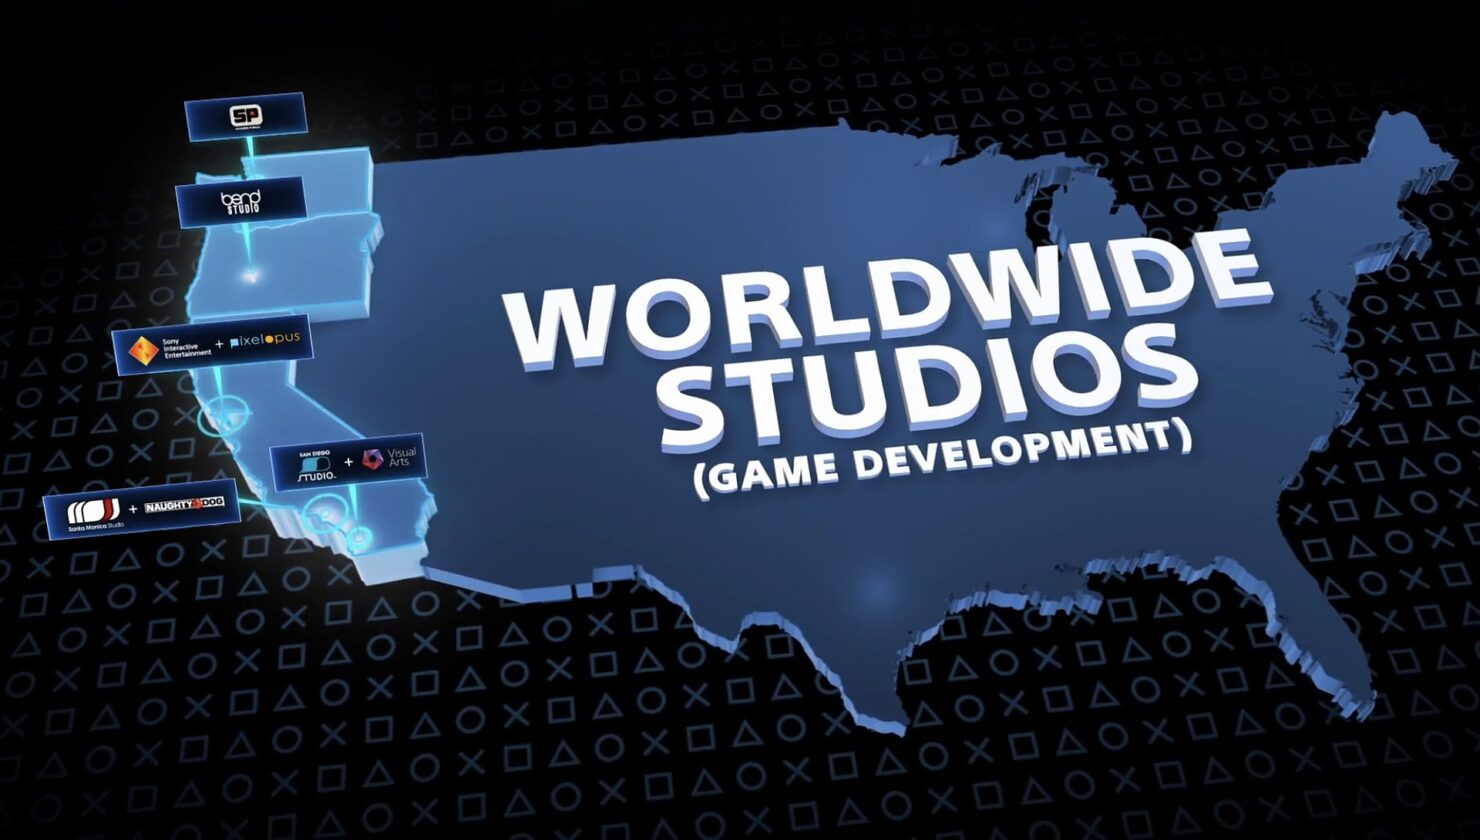 Sony Worldwide Studios